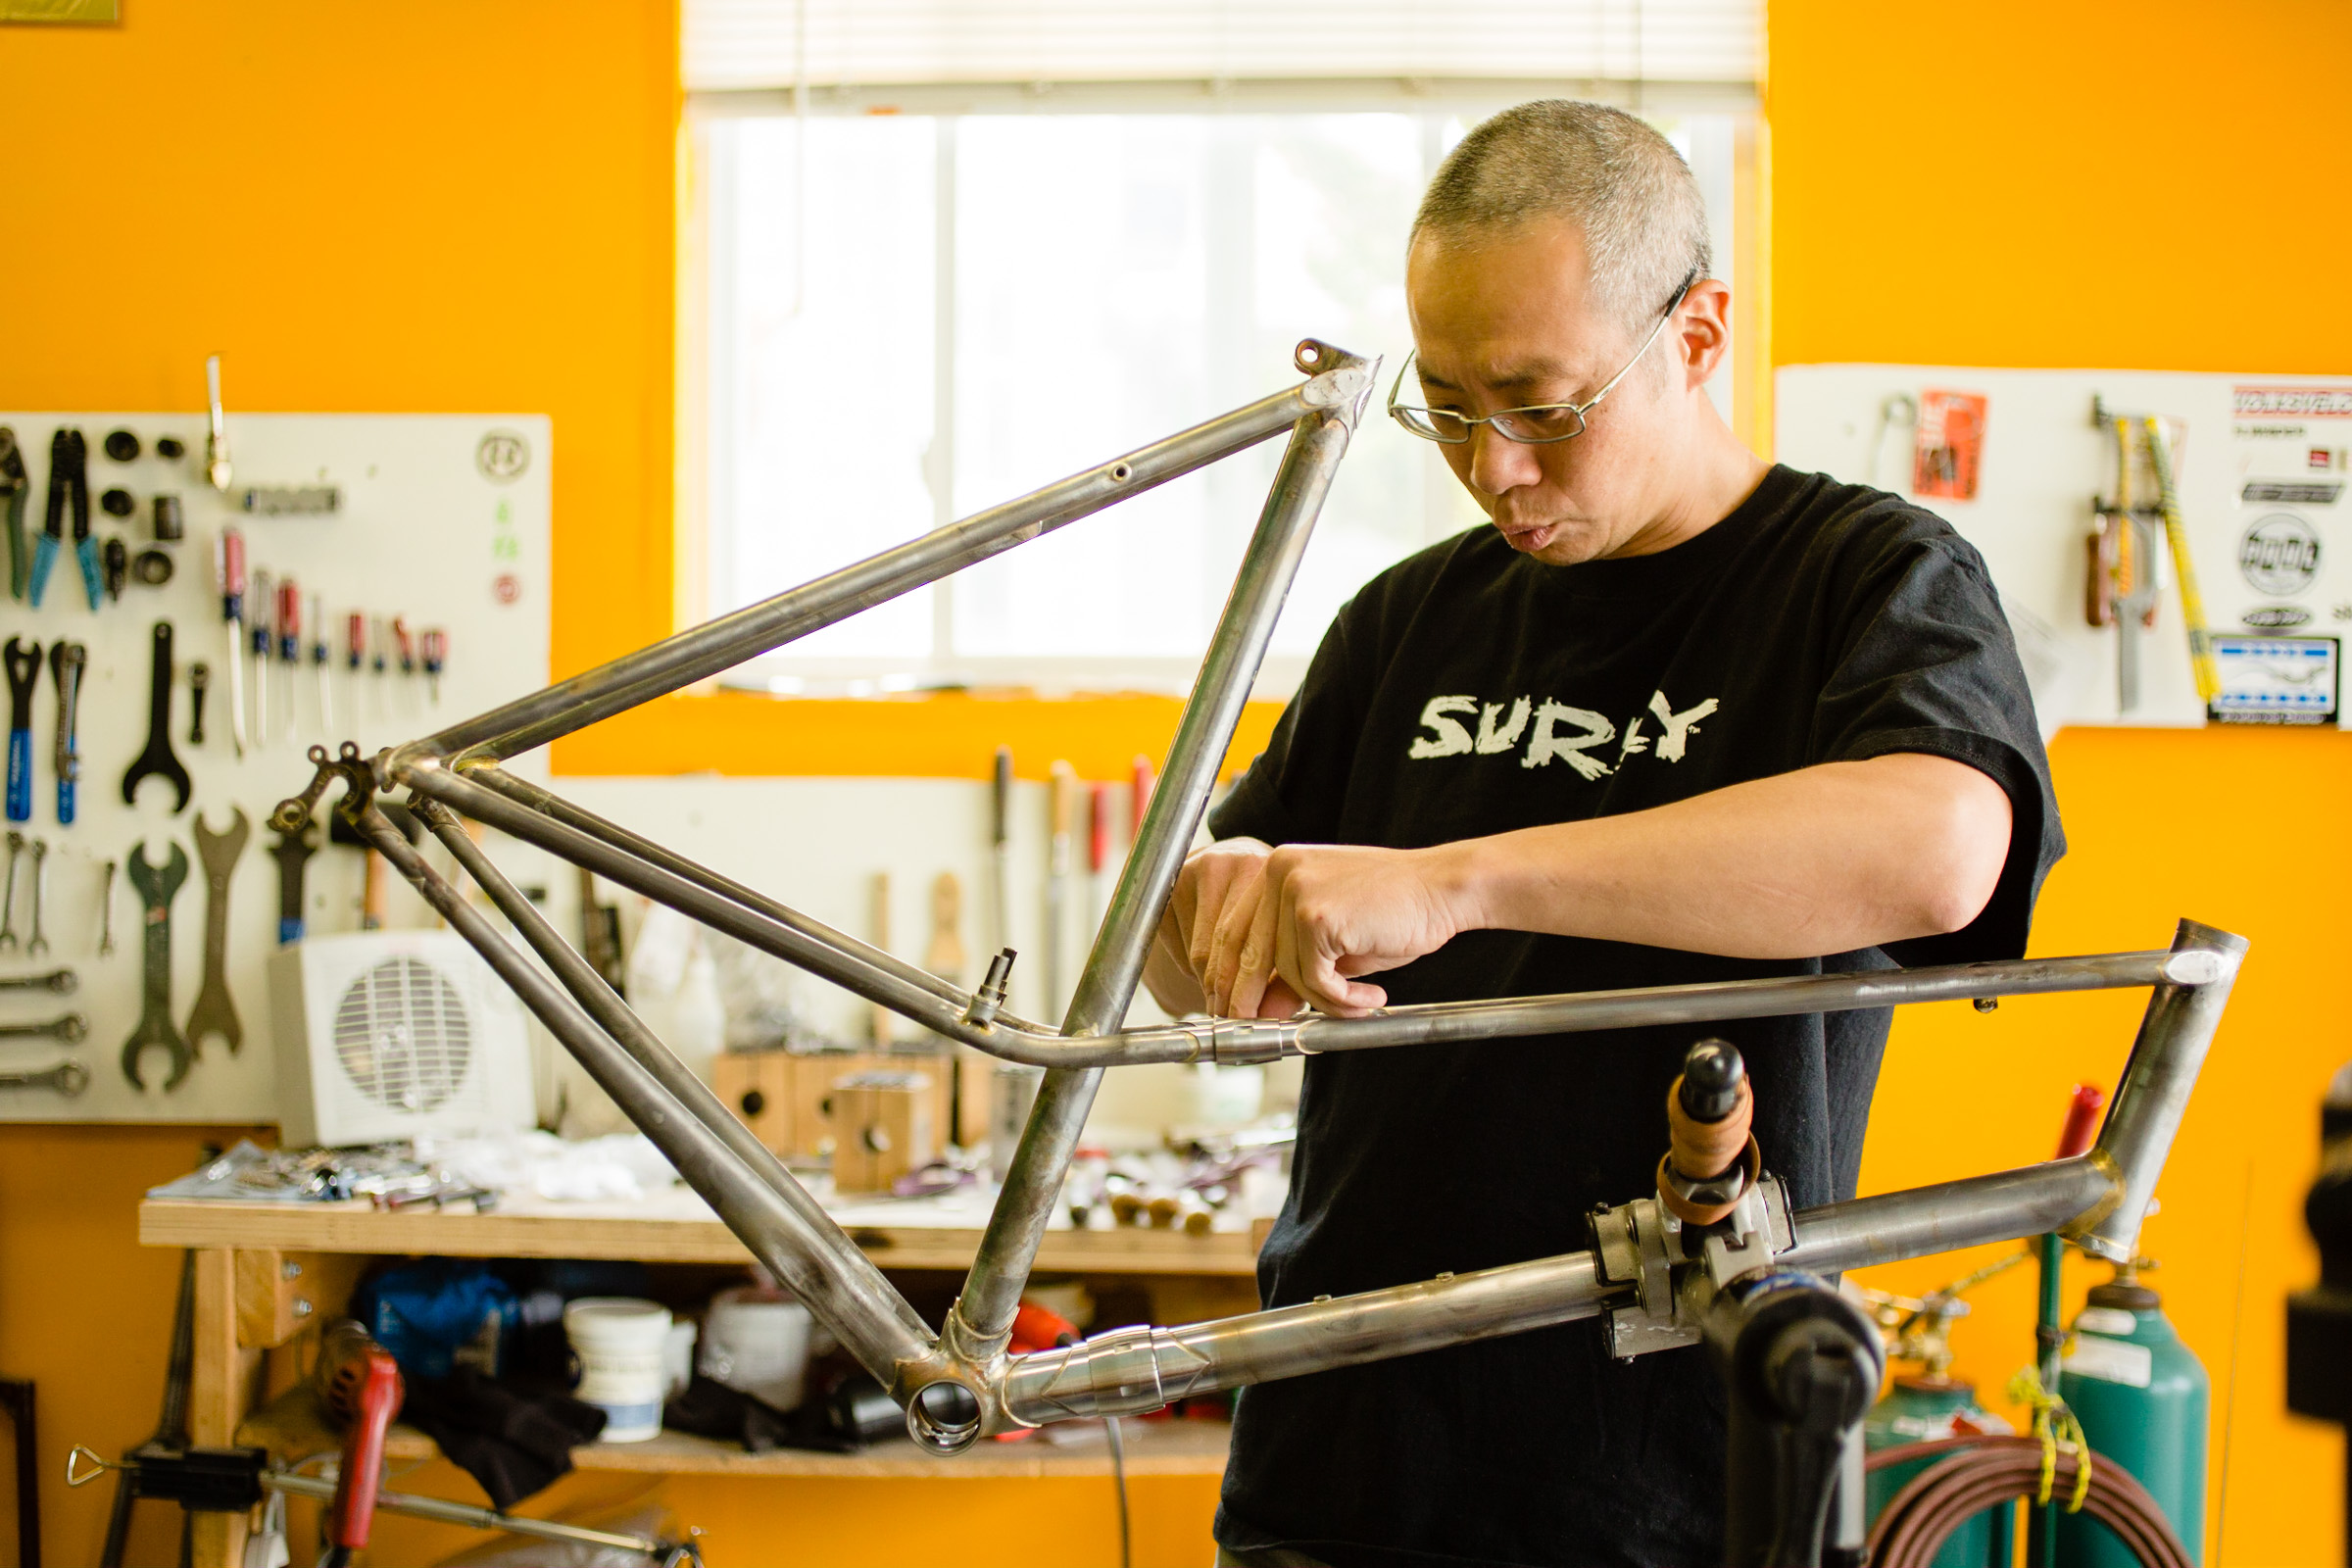 047.yipsan-bicycles-creators-series.traverse.jpg